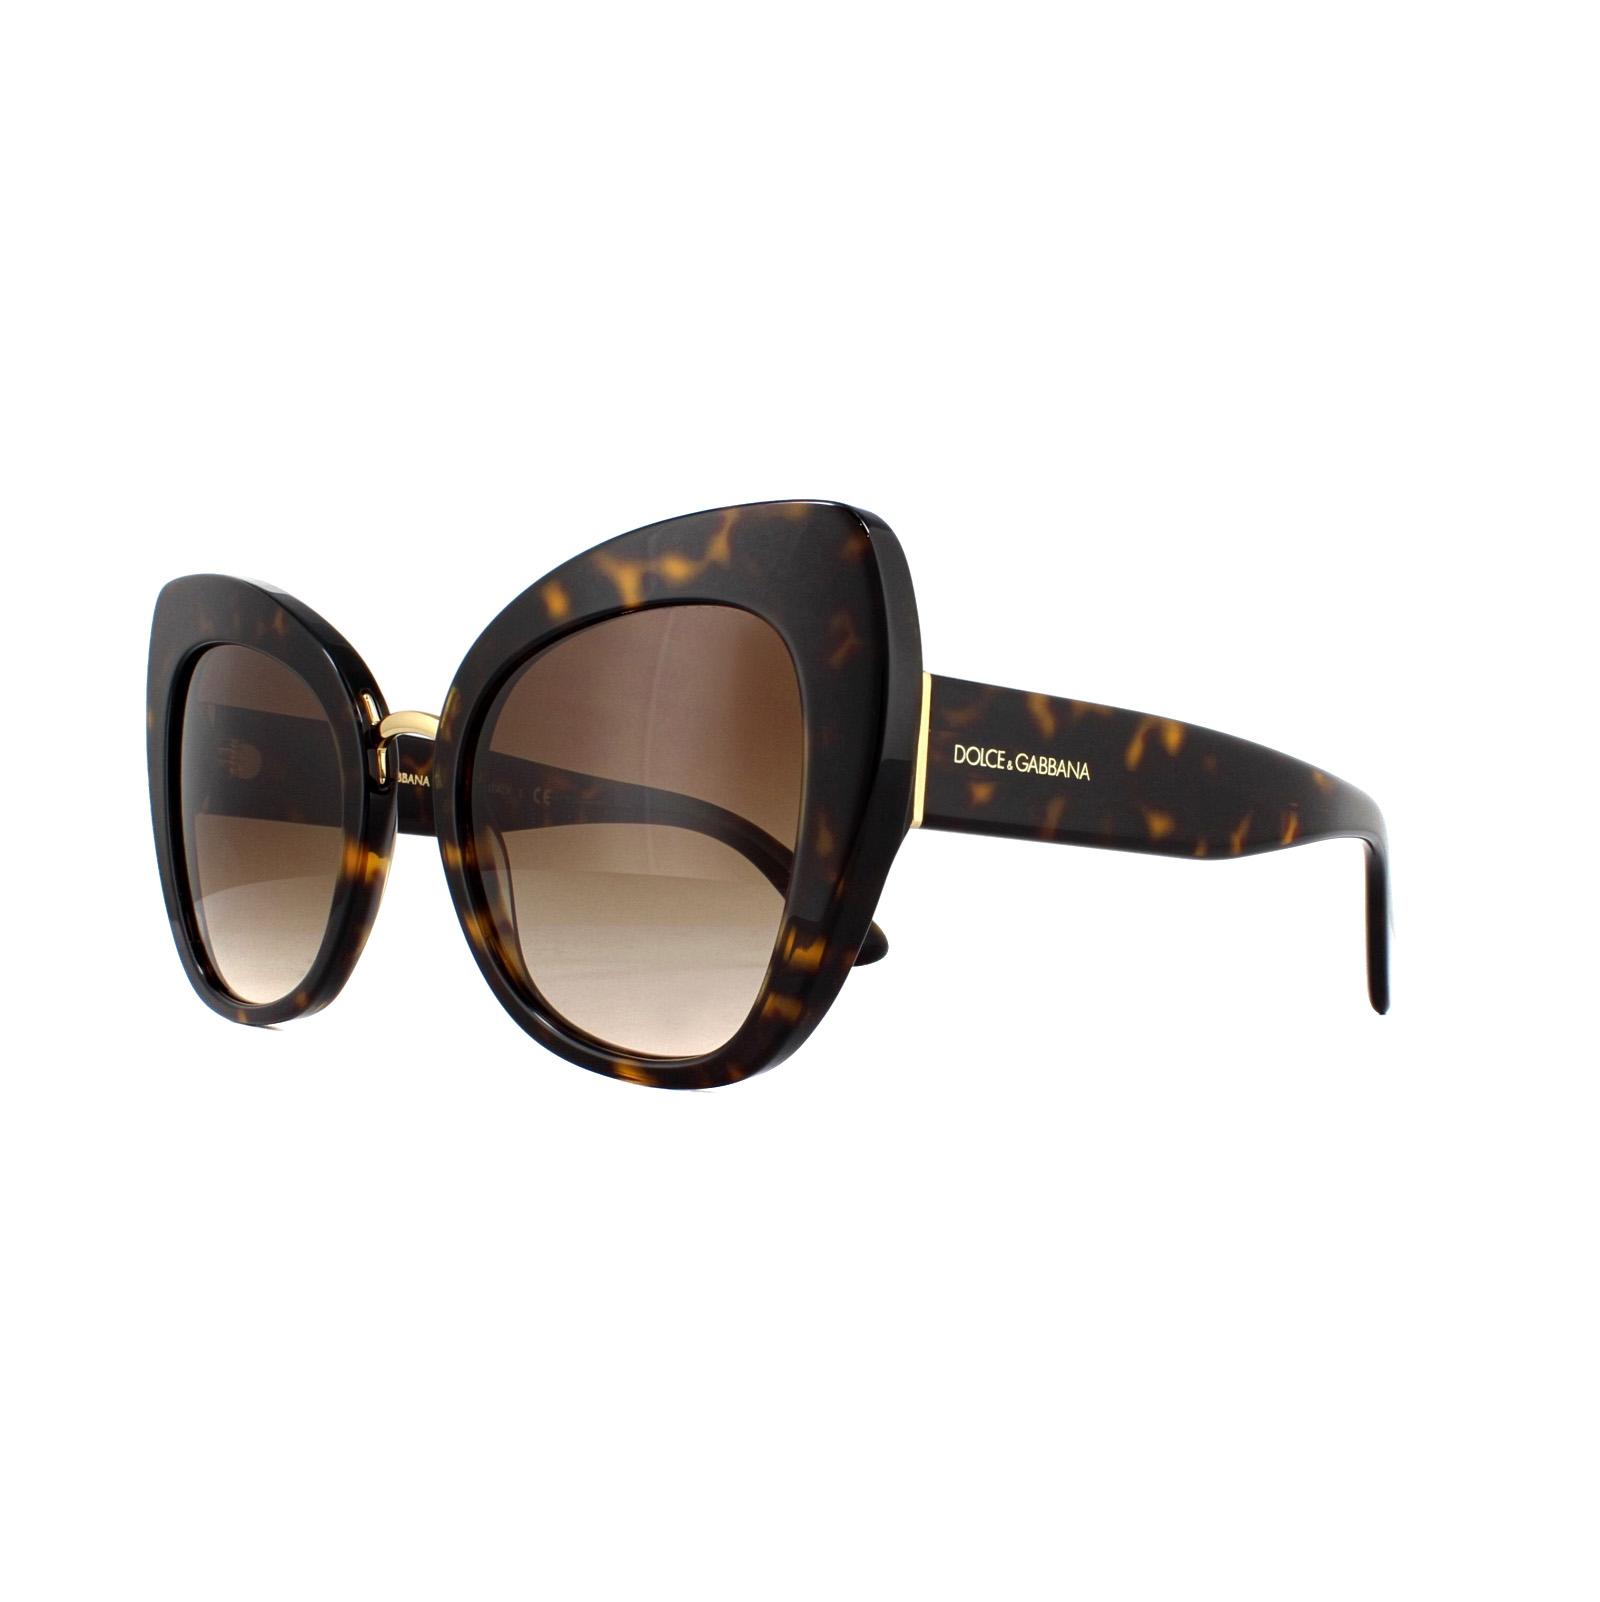 60cdc45610e6 Sentinel Dolce   Gabbana Sunglasses DG4319 502 13 Havana Brown Gradient